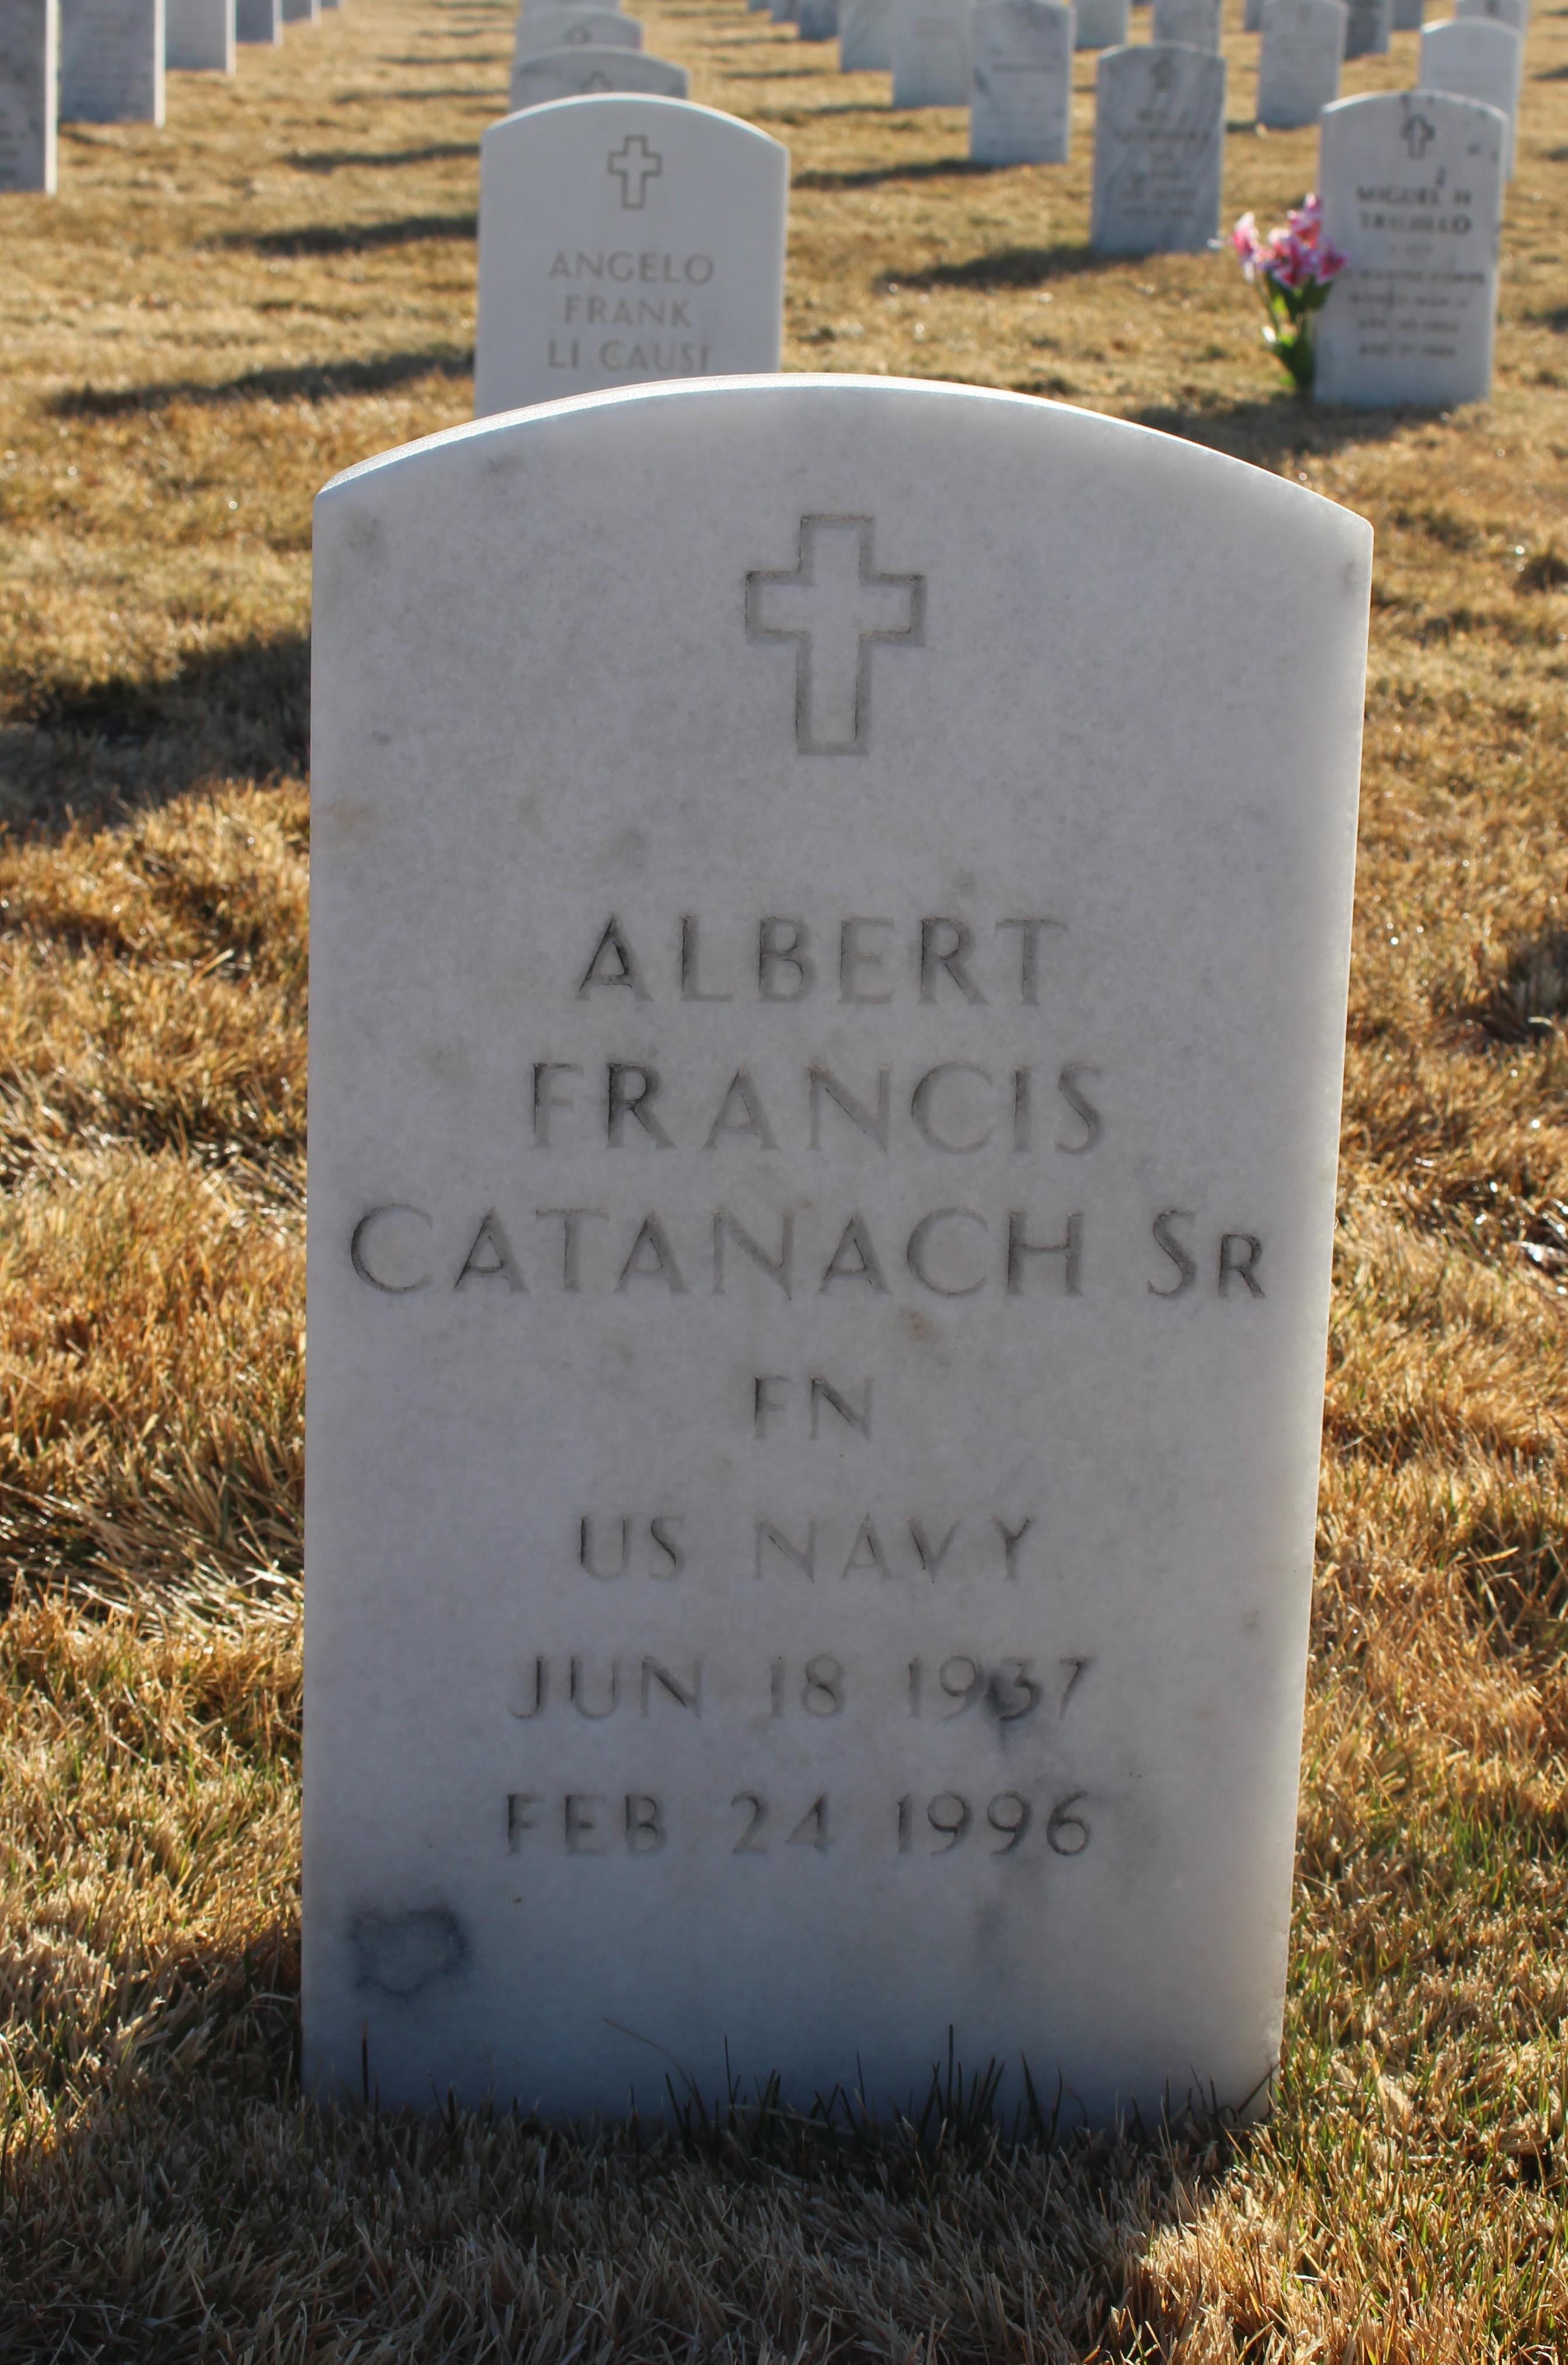 Albert Francis Catanach, SR